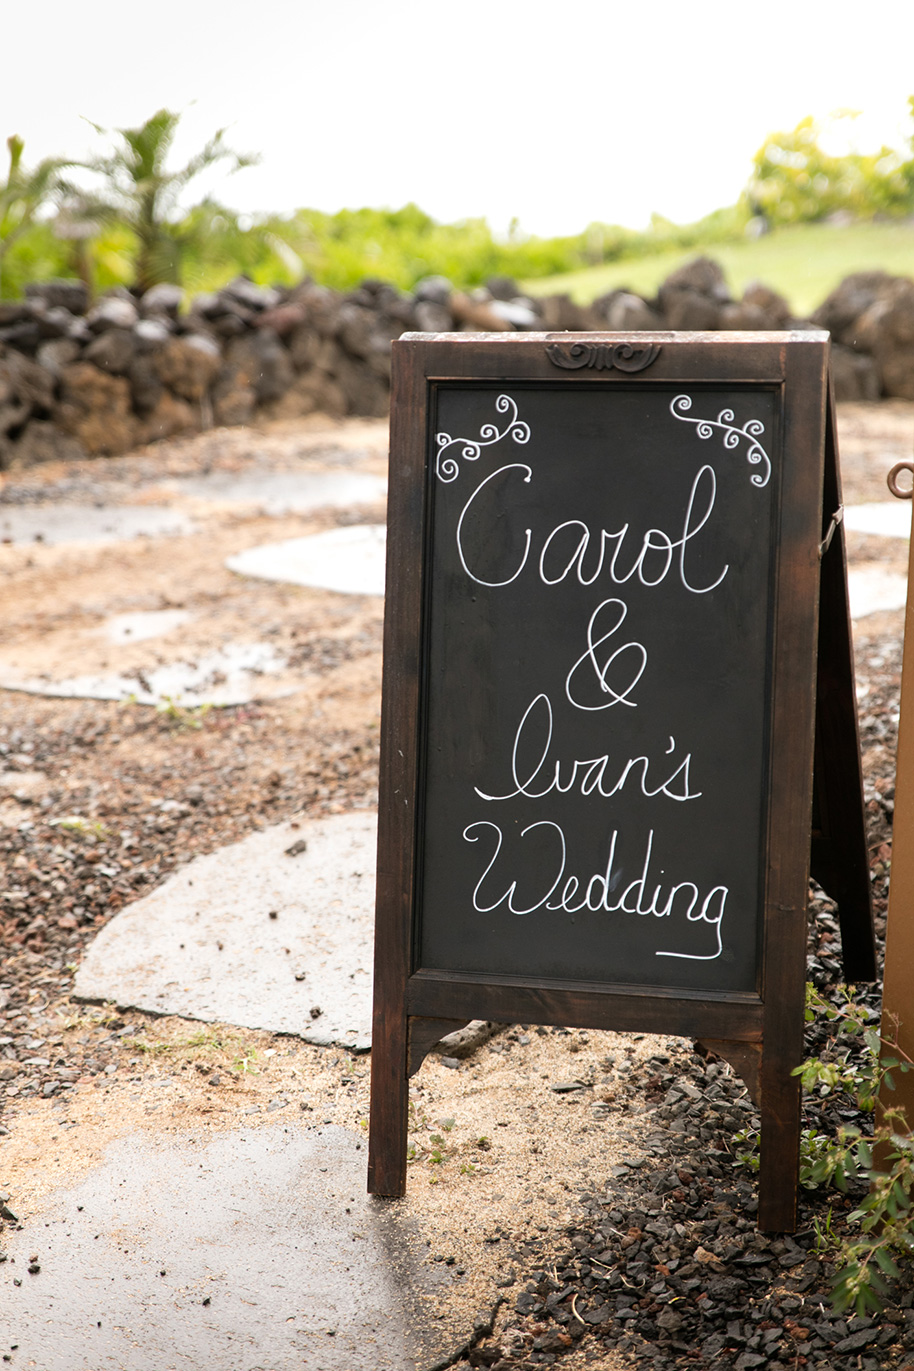 Maui-Ocean-Front-Wedding-070816-2